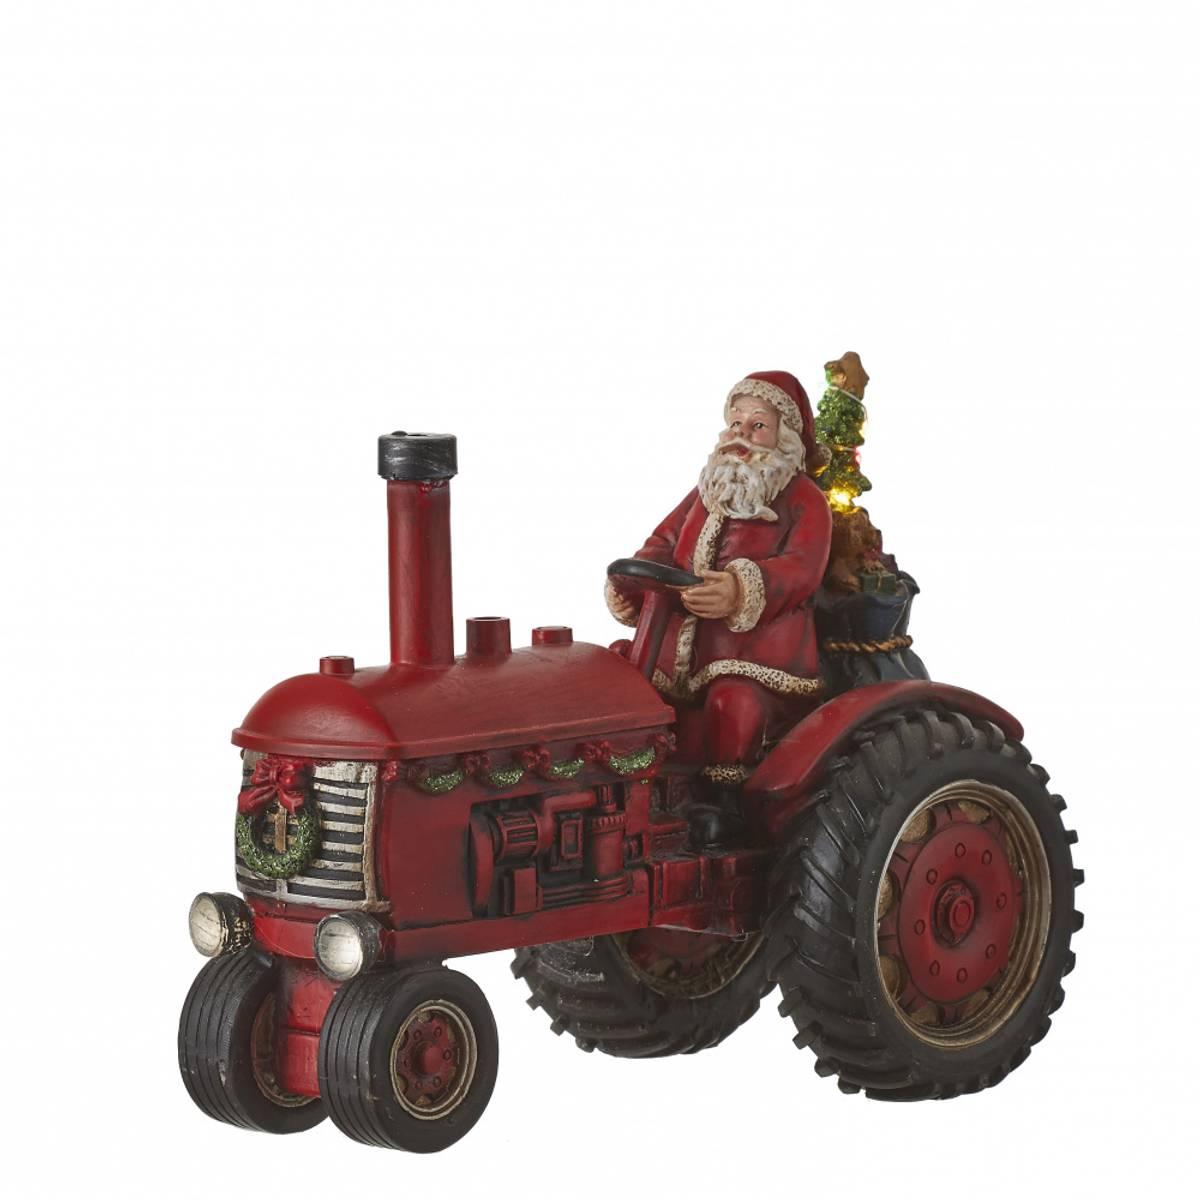 Julenisse på rød traktor - juleby Luville